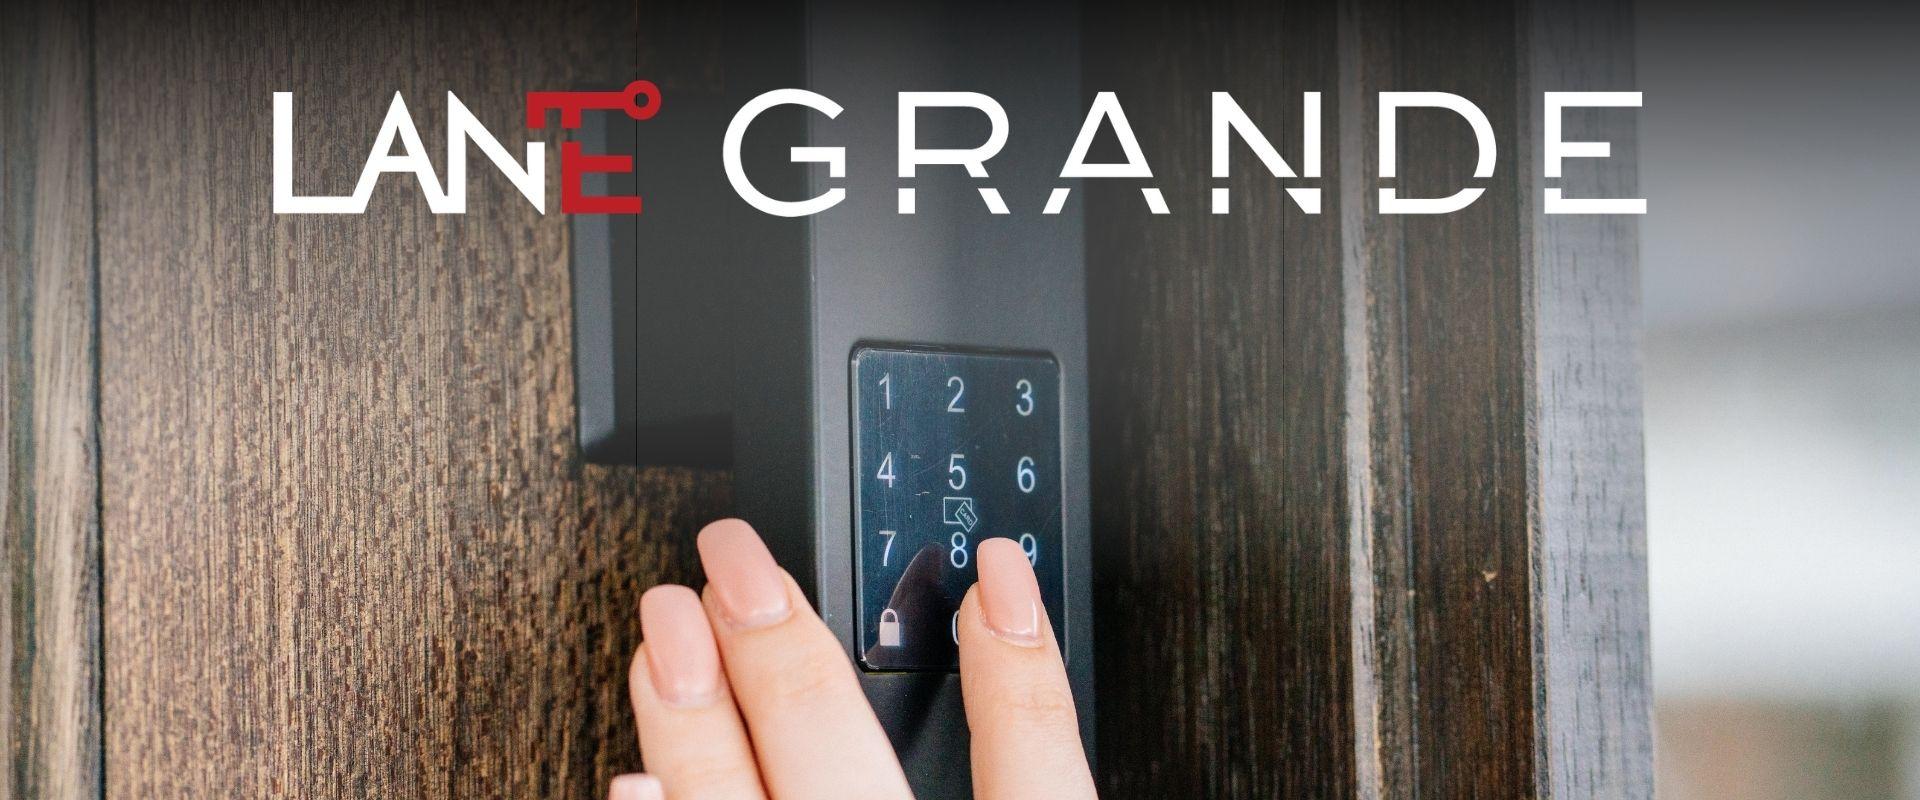 Lane Grande hand on touchpad matte black